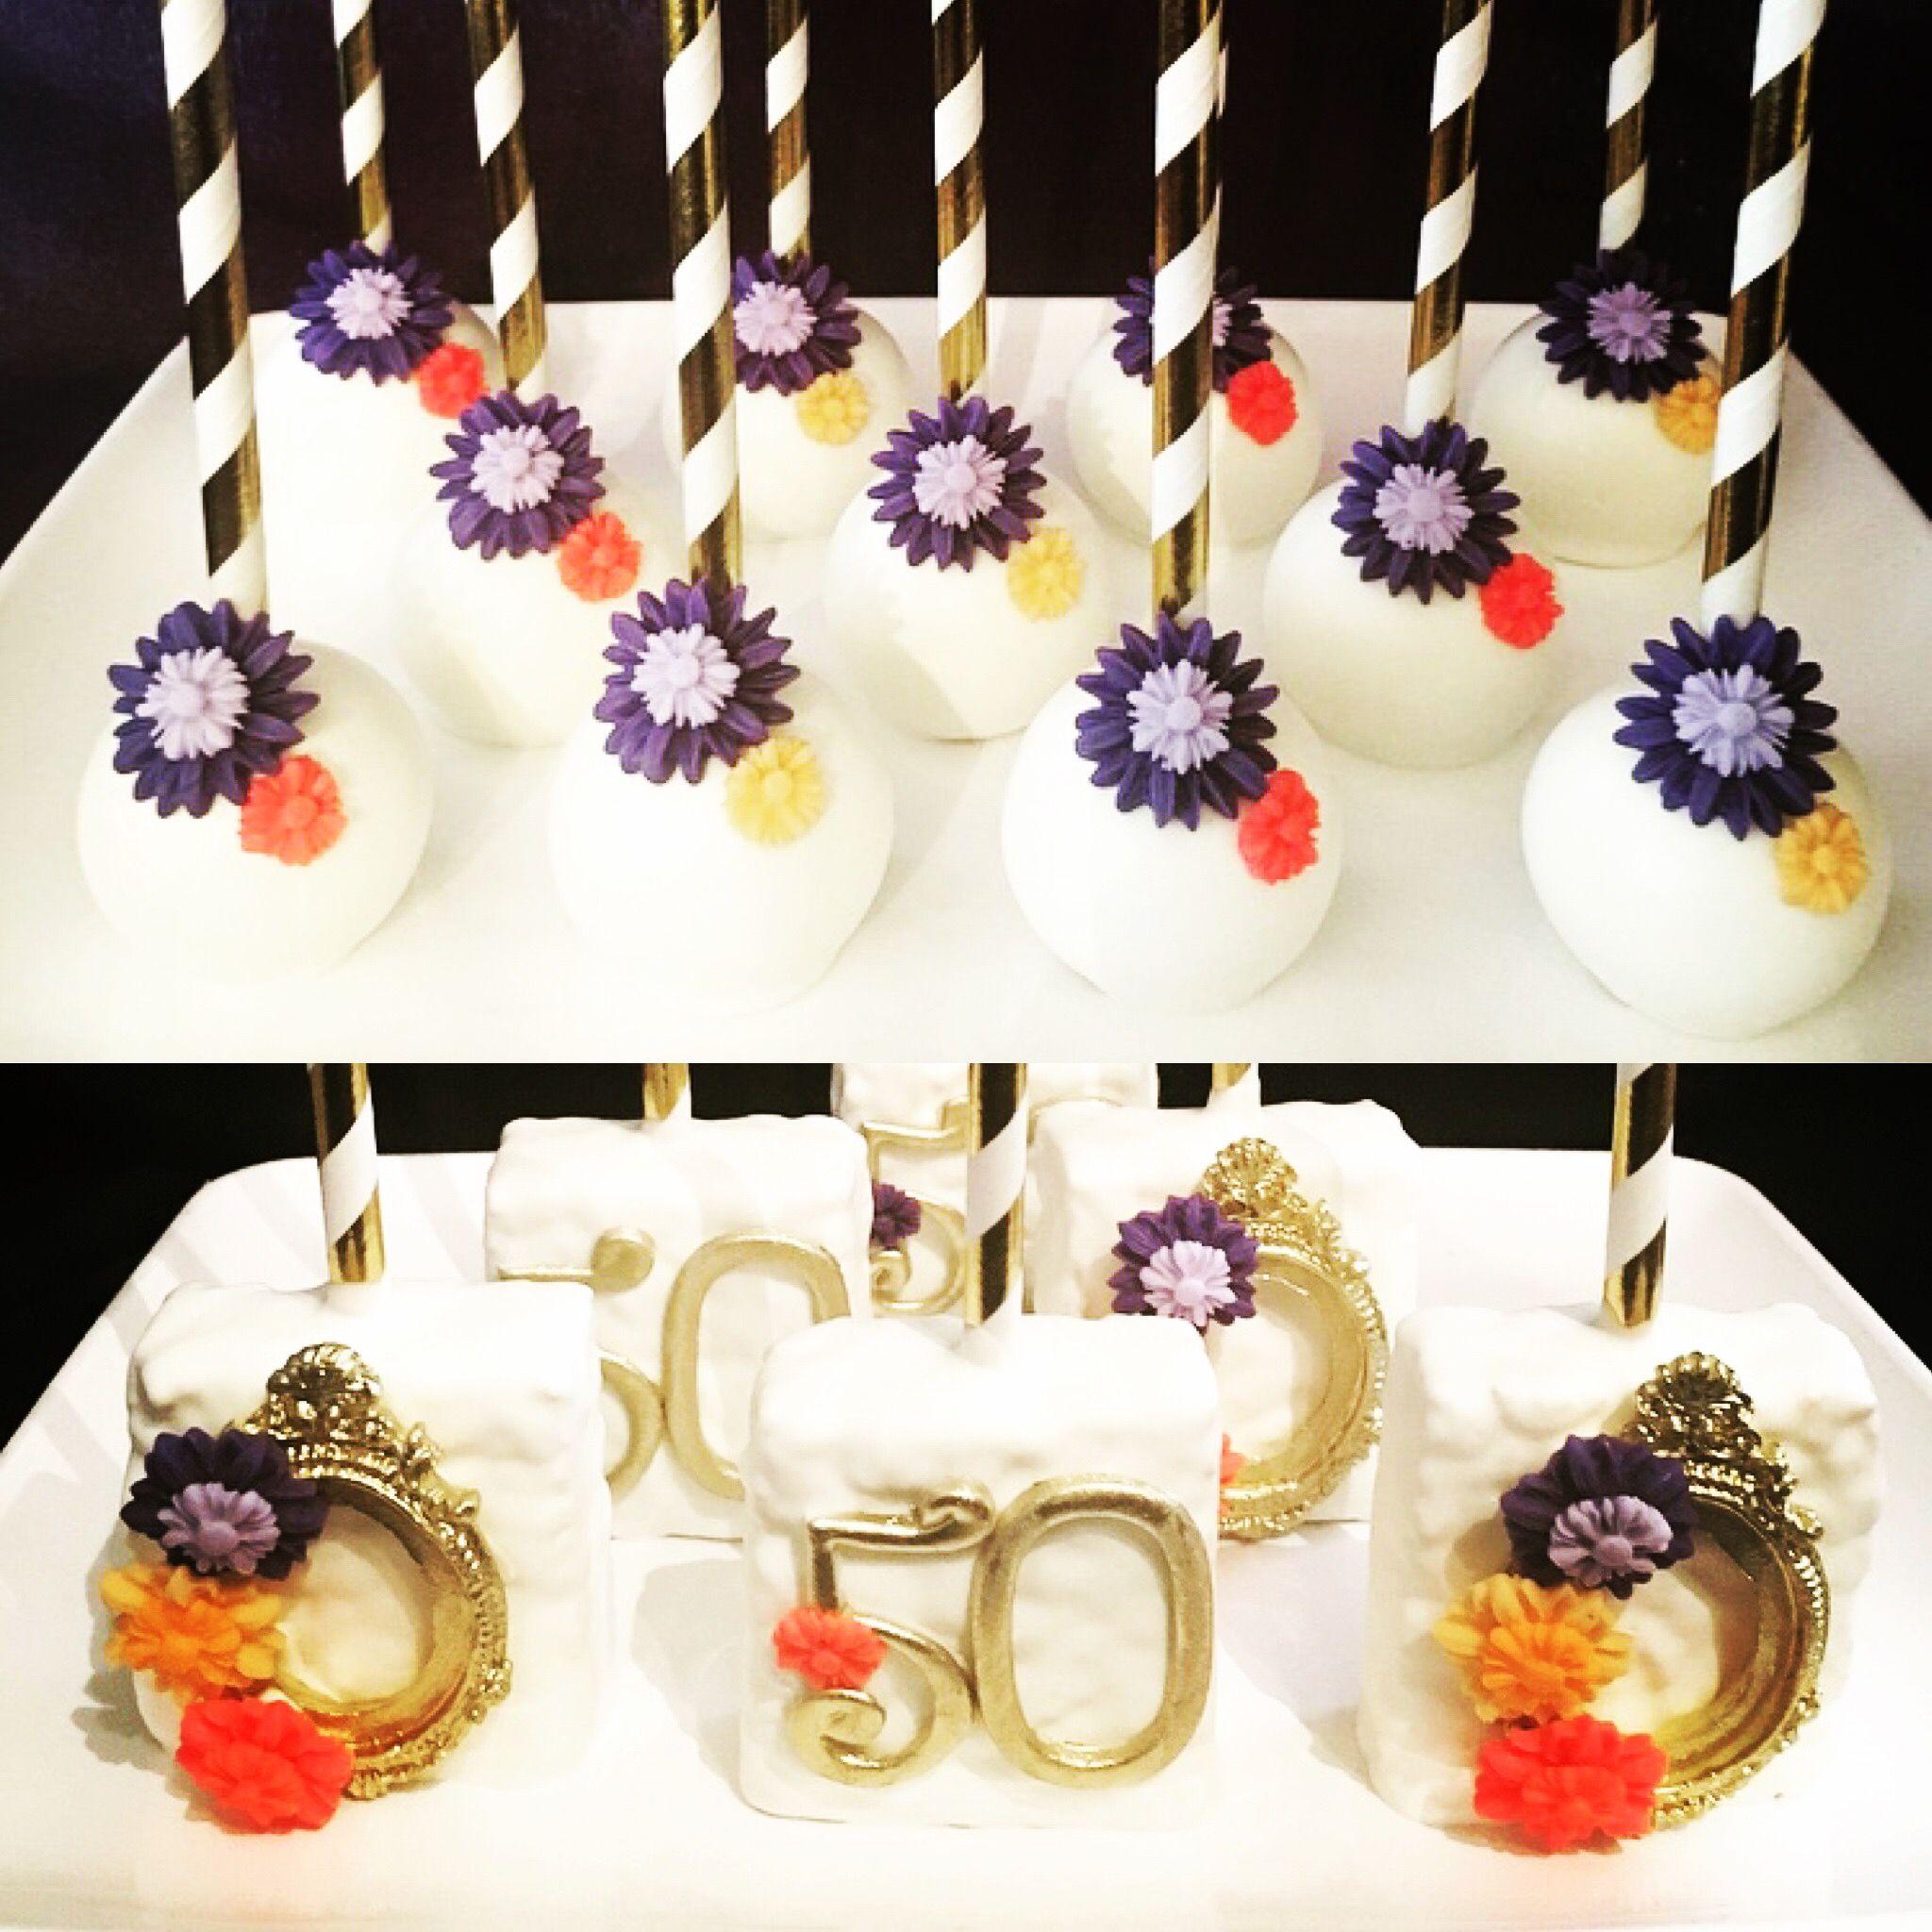 Remarkable Floral 50Th Birthday Treats 50Th Birthday Cake Pops Floral Cake Funny Birthday Cards Online Inifodamsfinfo